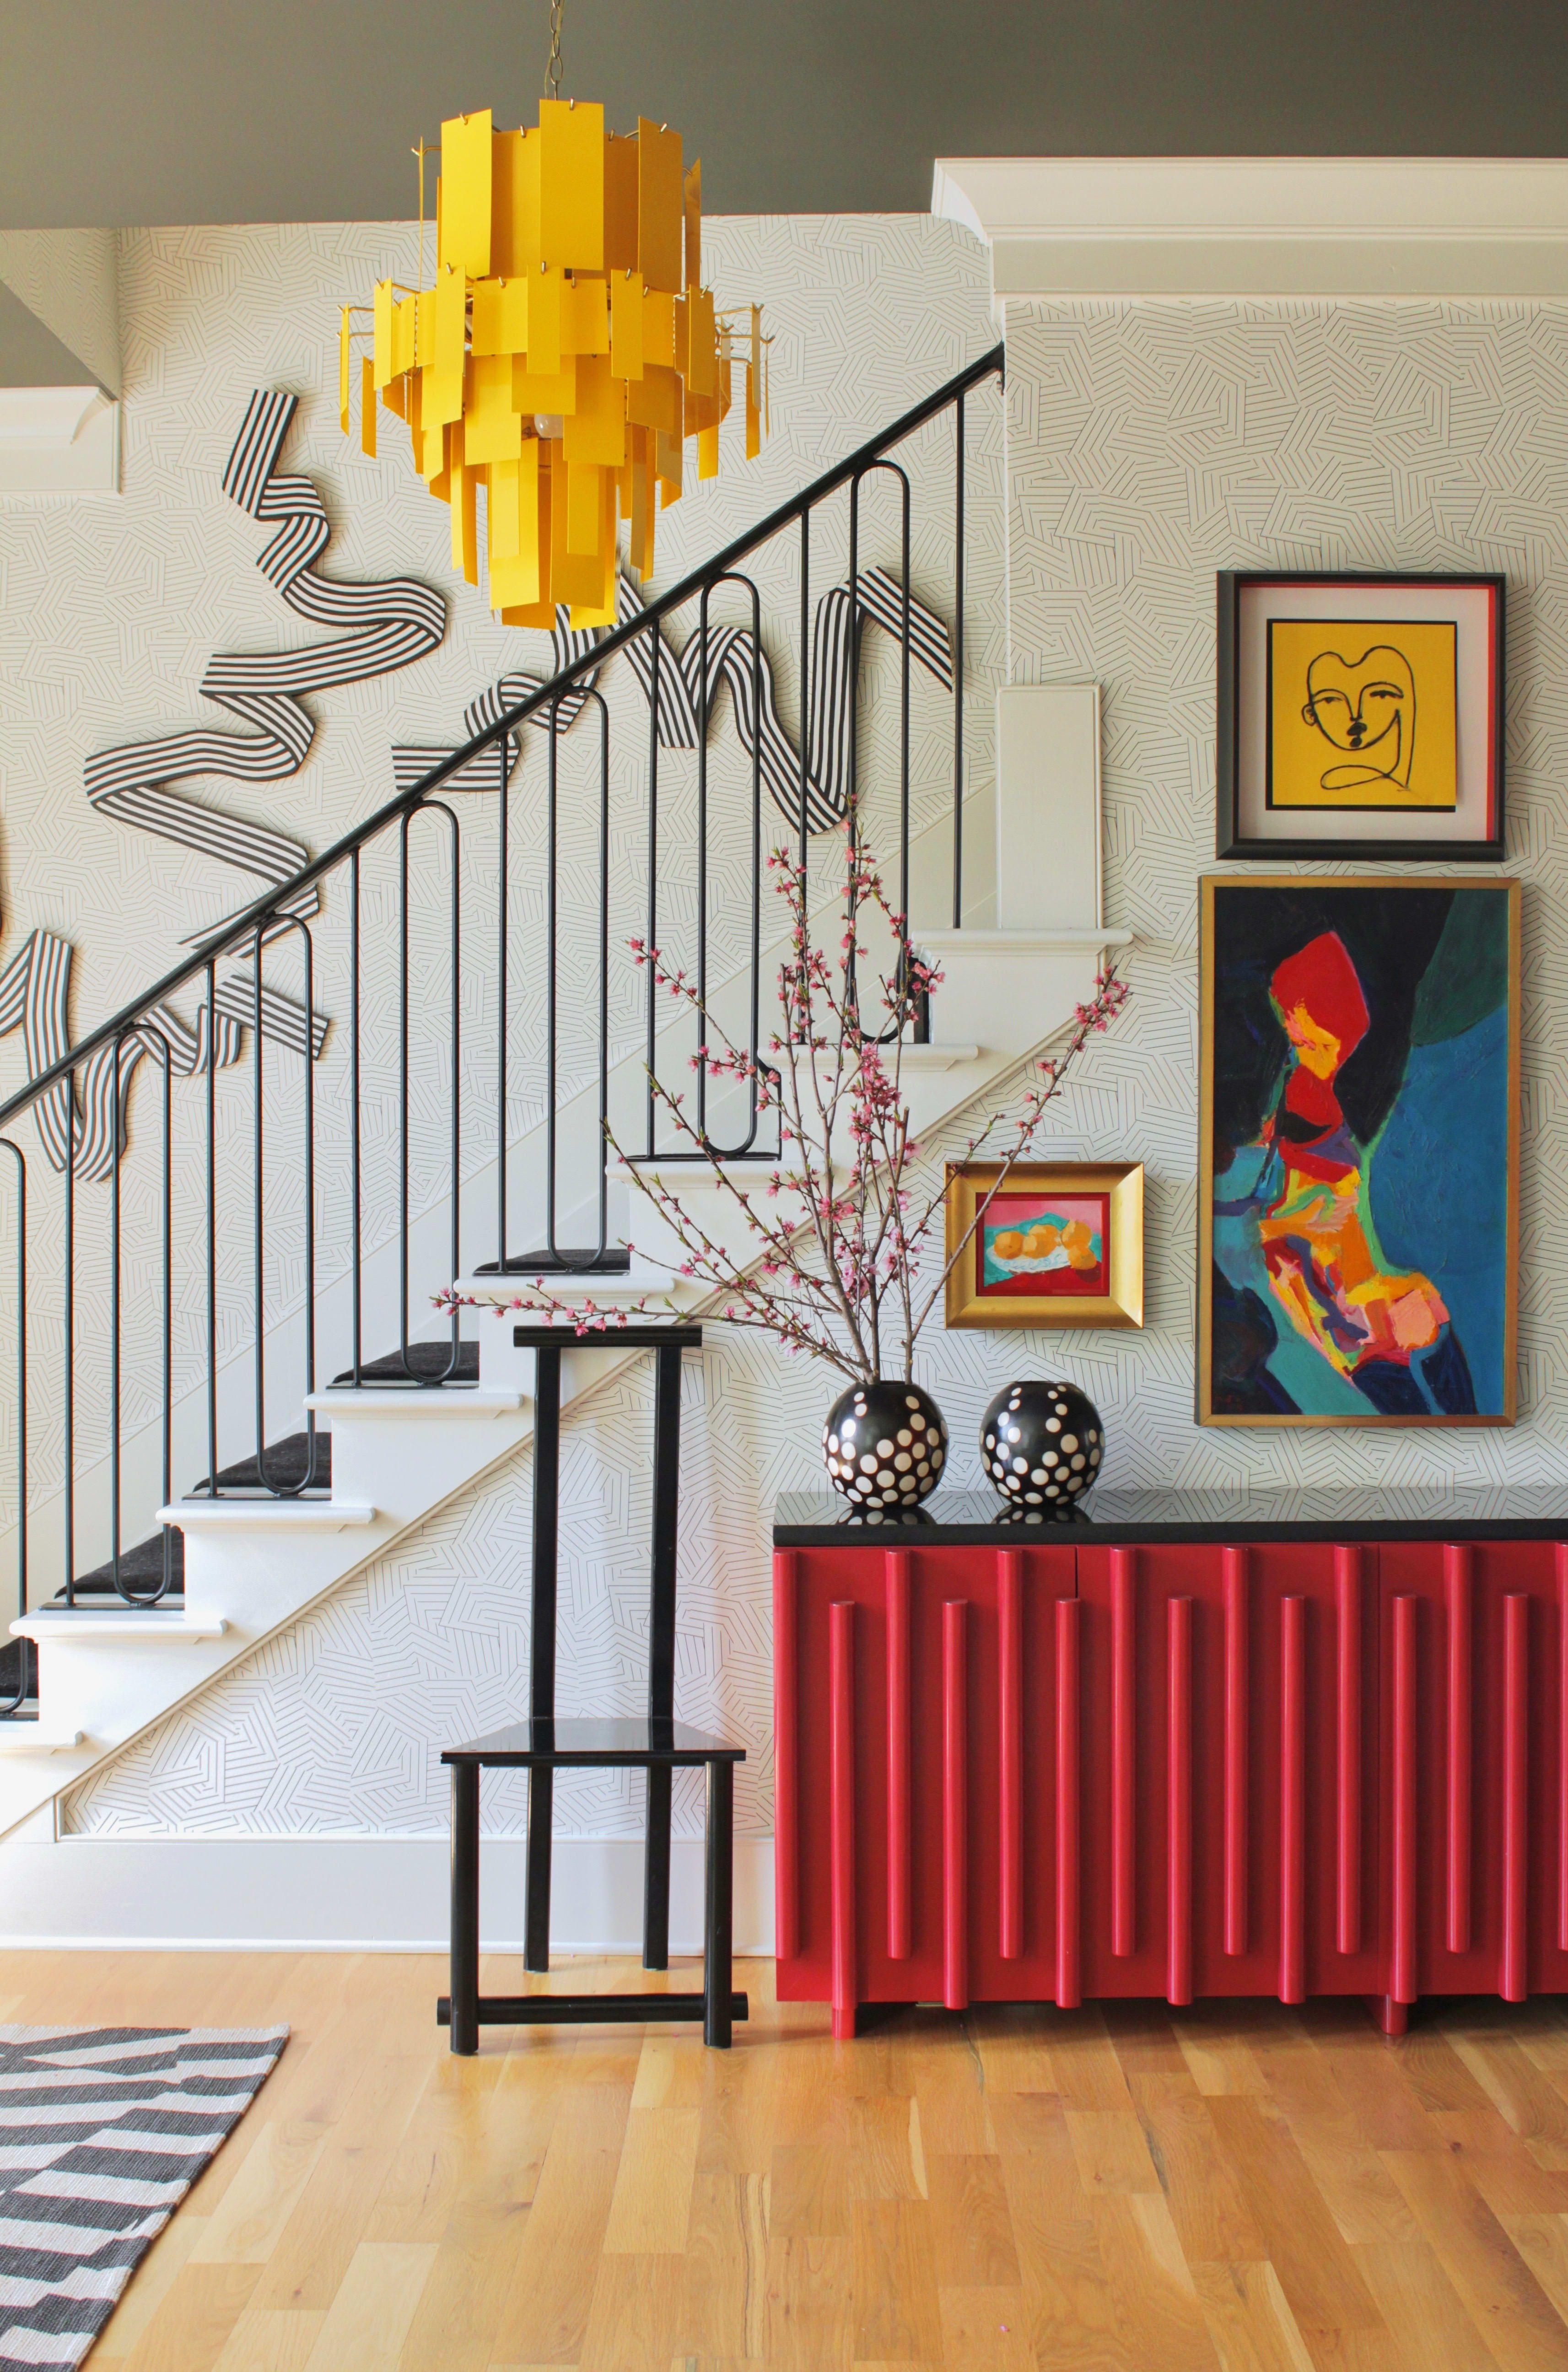 These Are The Biggest Spring Color Trends For 2019 Decoration Interieur Design Deco Maison Couleur Interieure